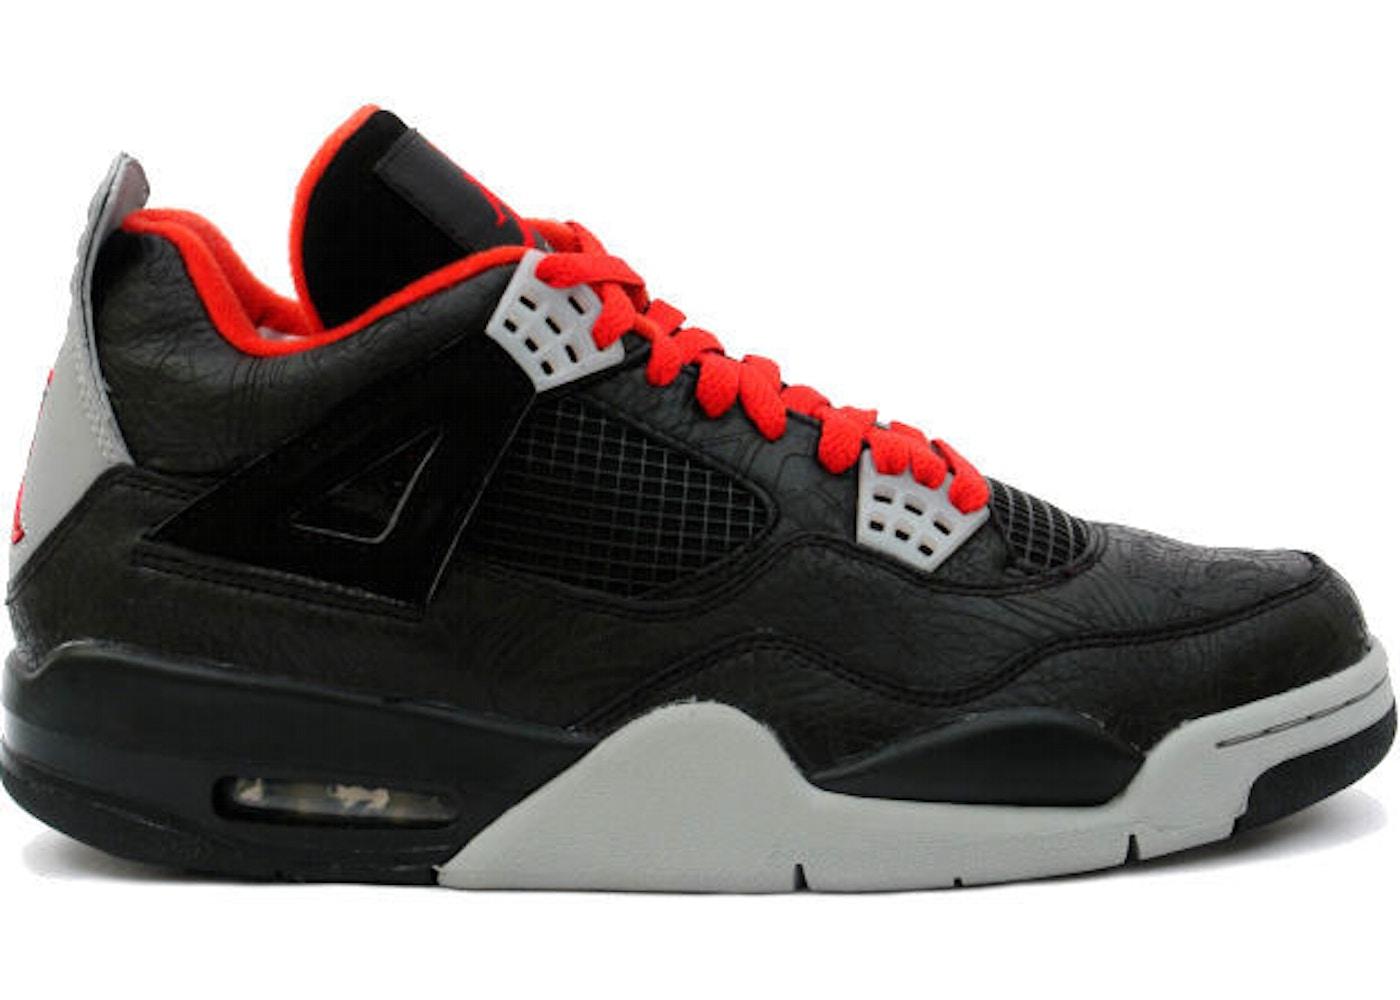 new arrivals 7727c e9c93 Buy Air Jordan 4 Size 18 Shoes   Deadstock Sneakers